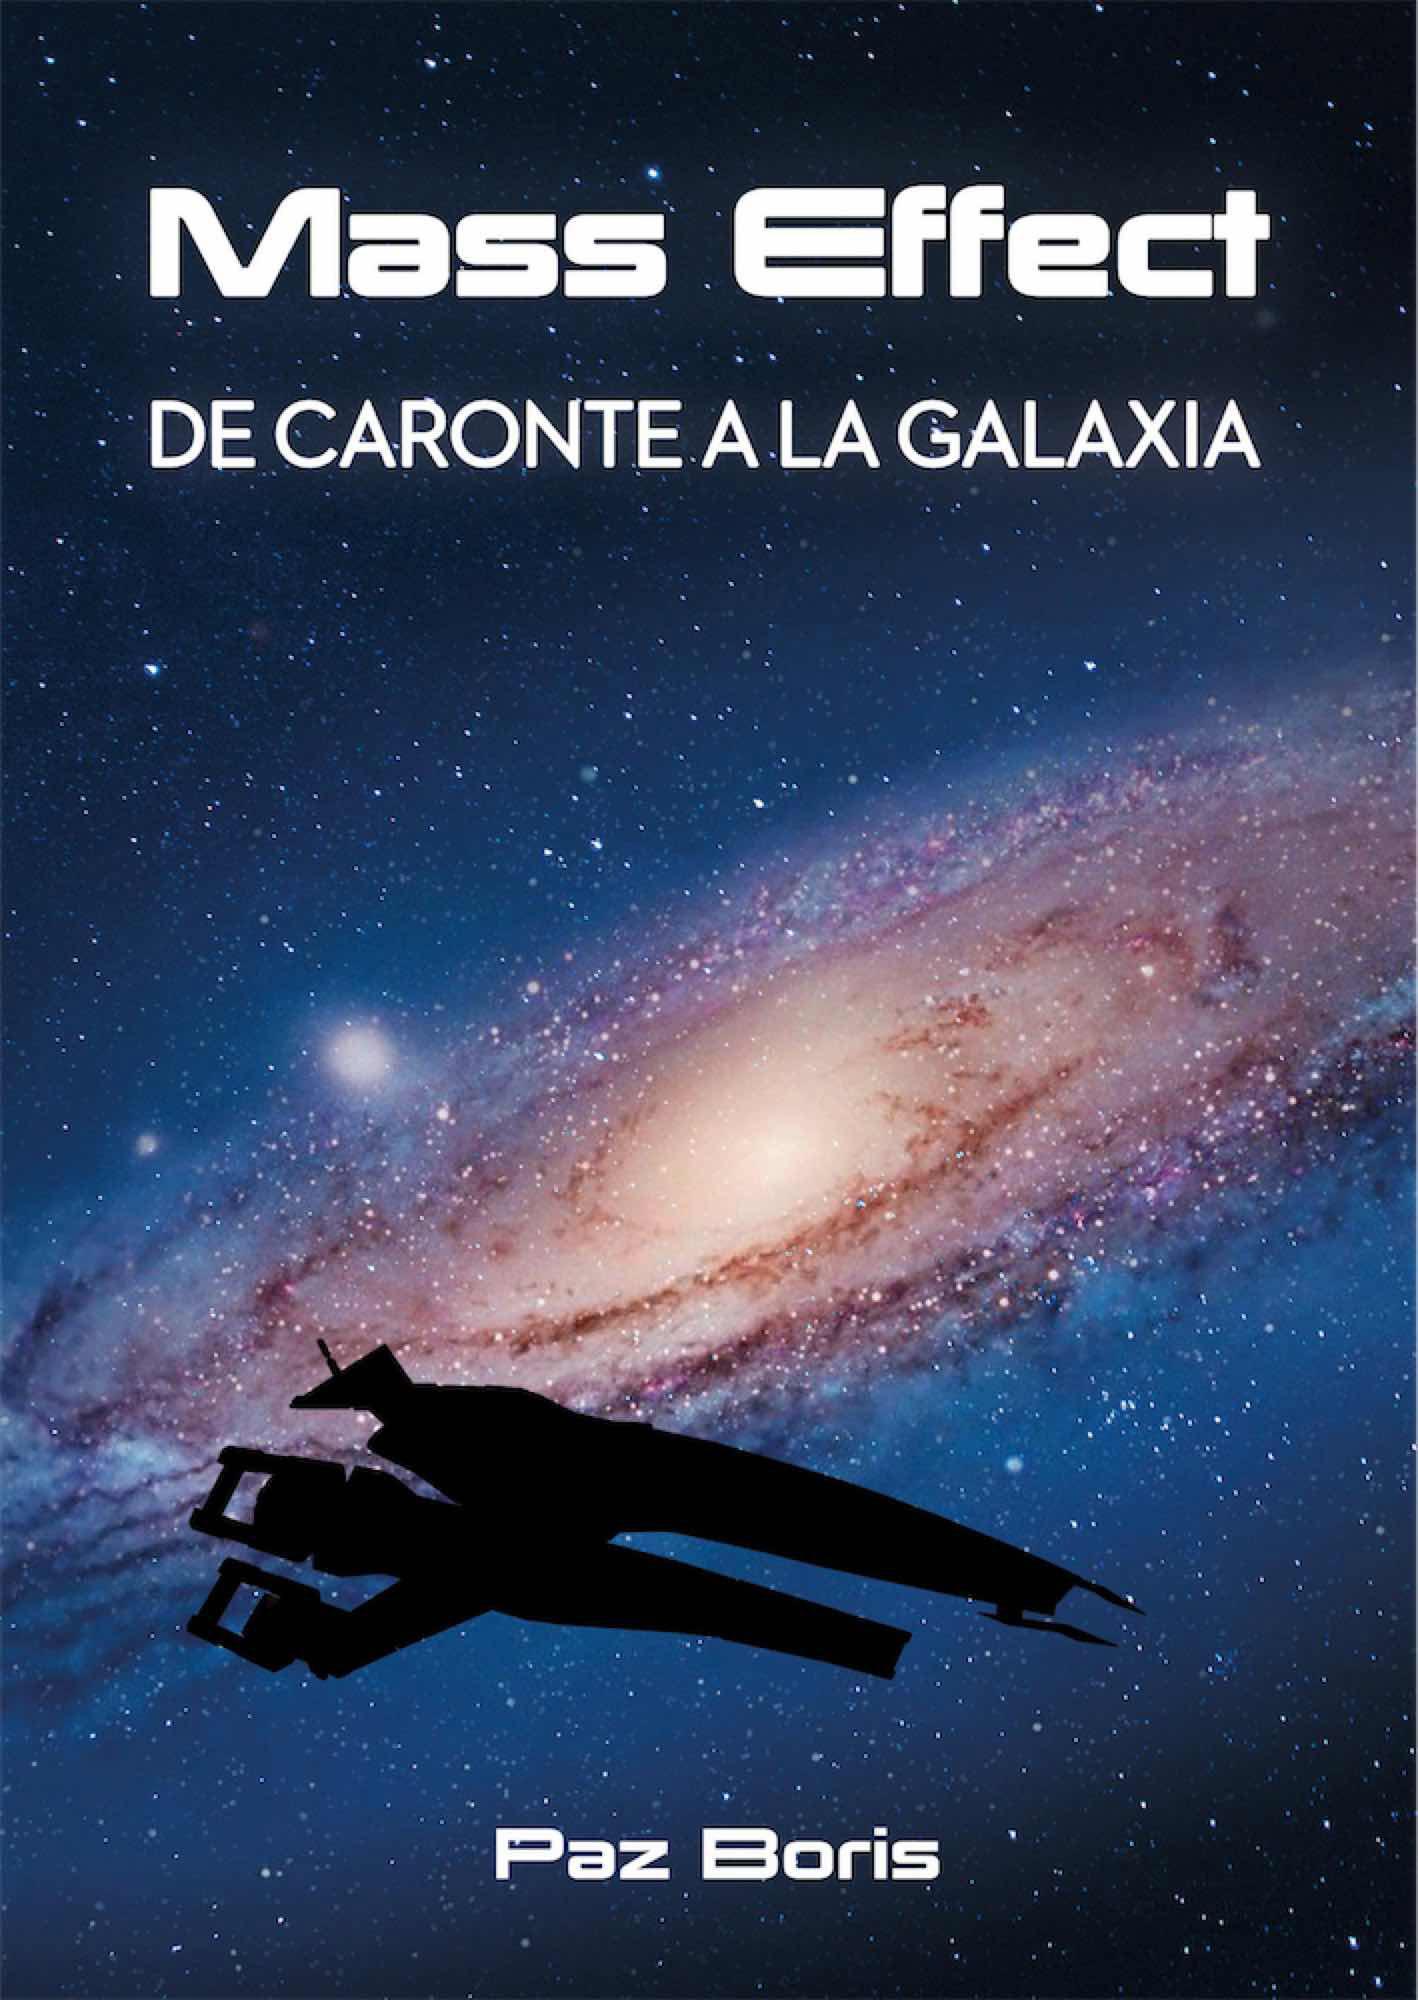 Libro Mass Effect de caronte a la Galaxia